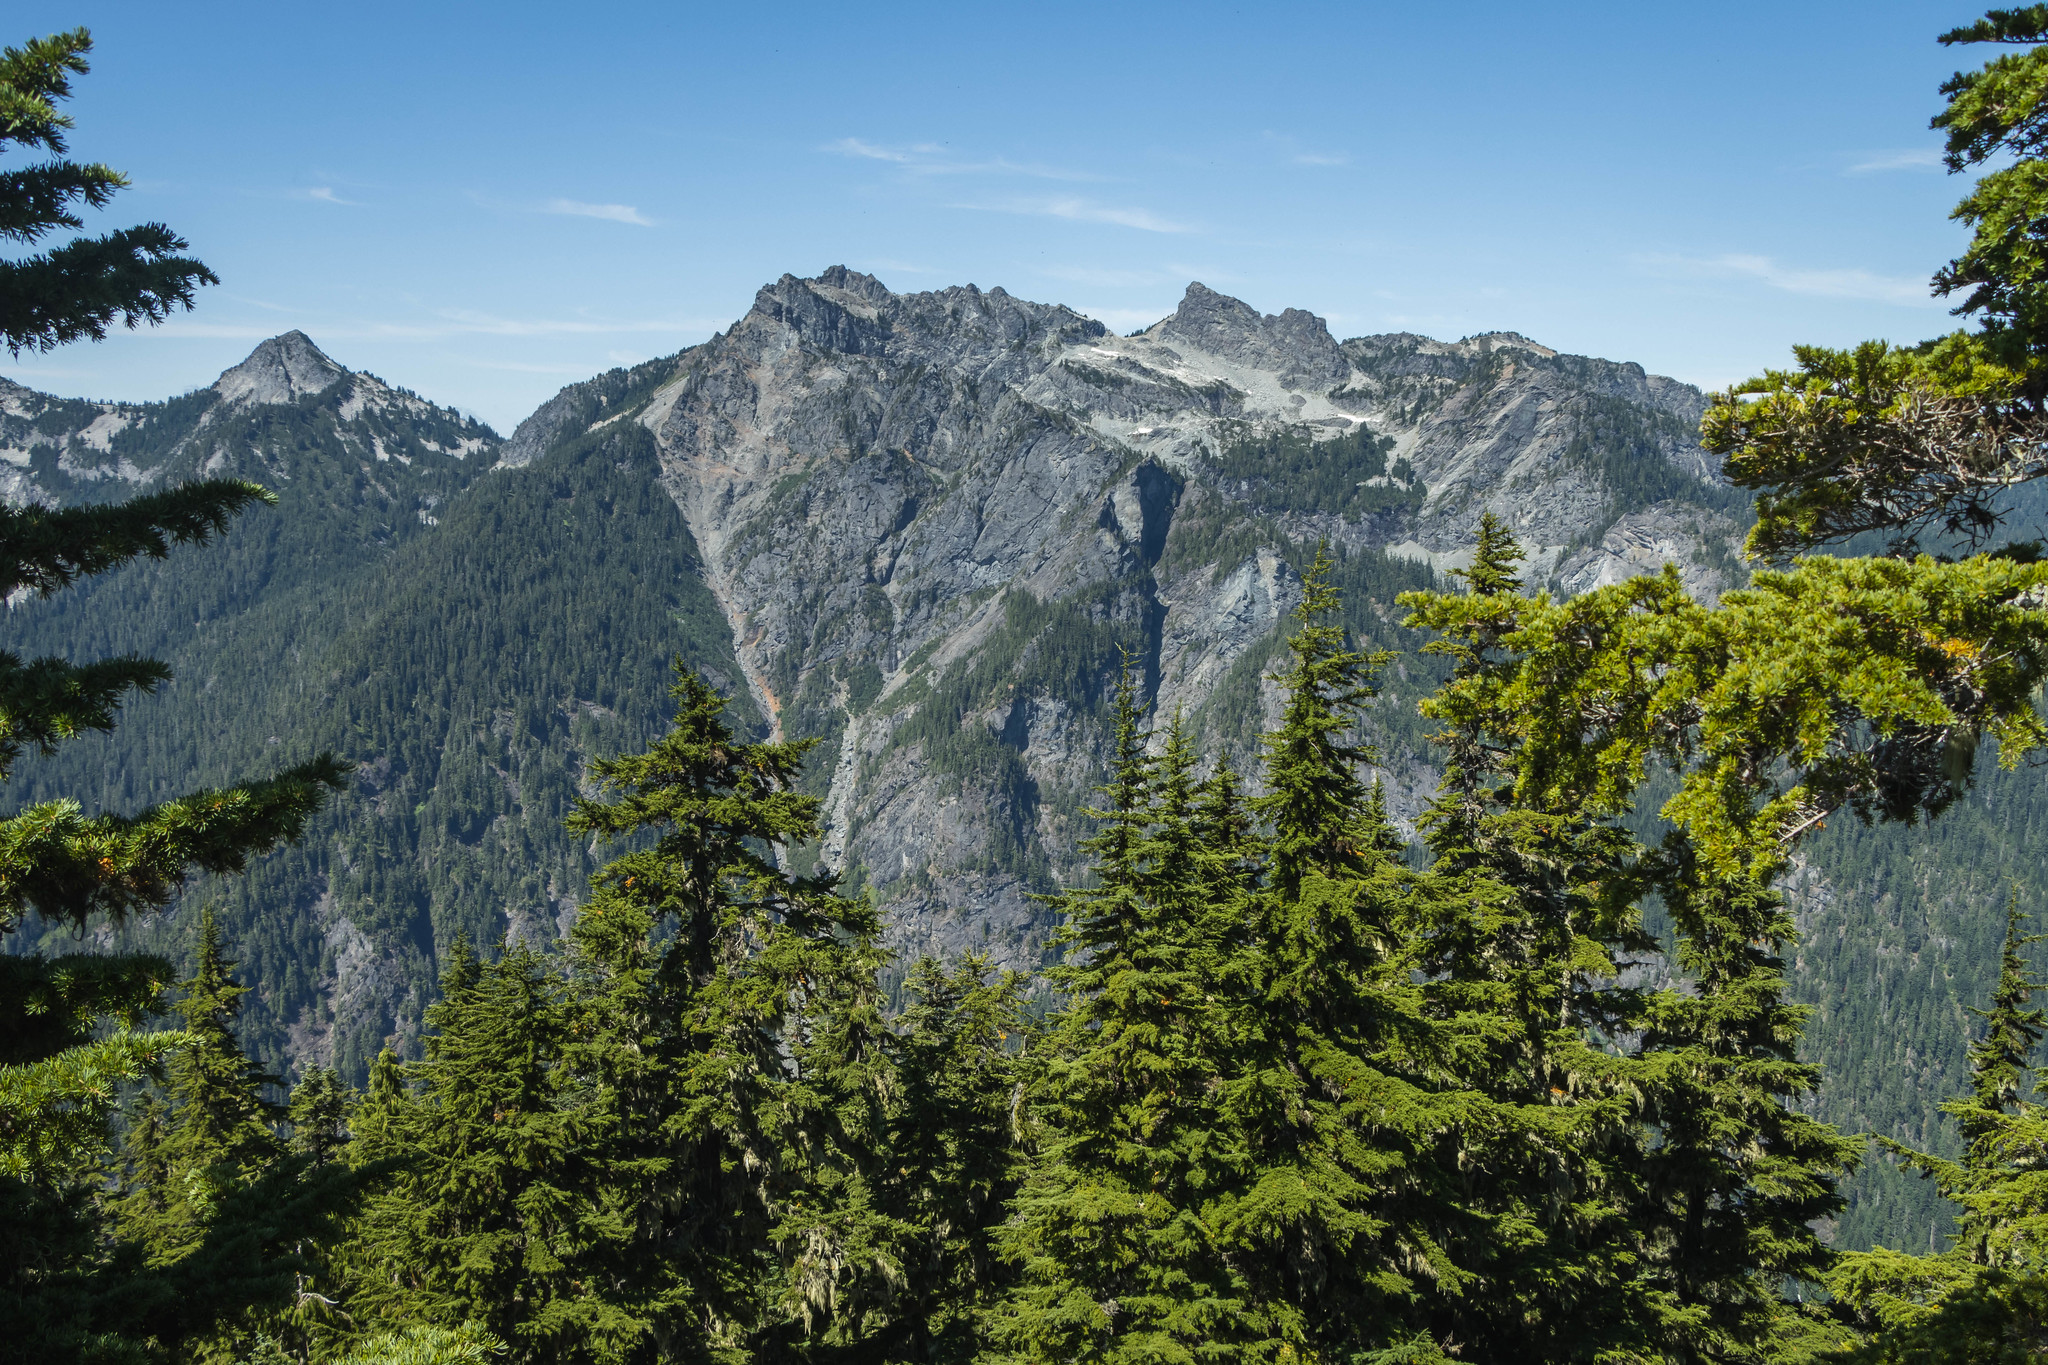 Ridgeview of Malachite Peak